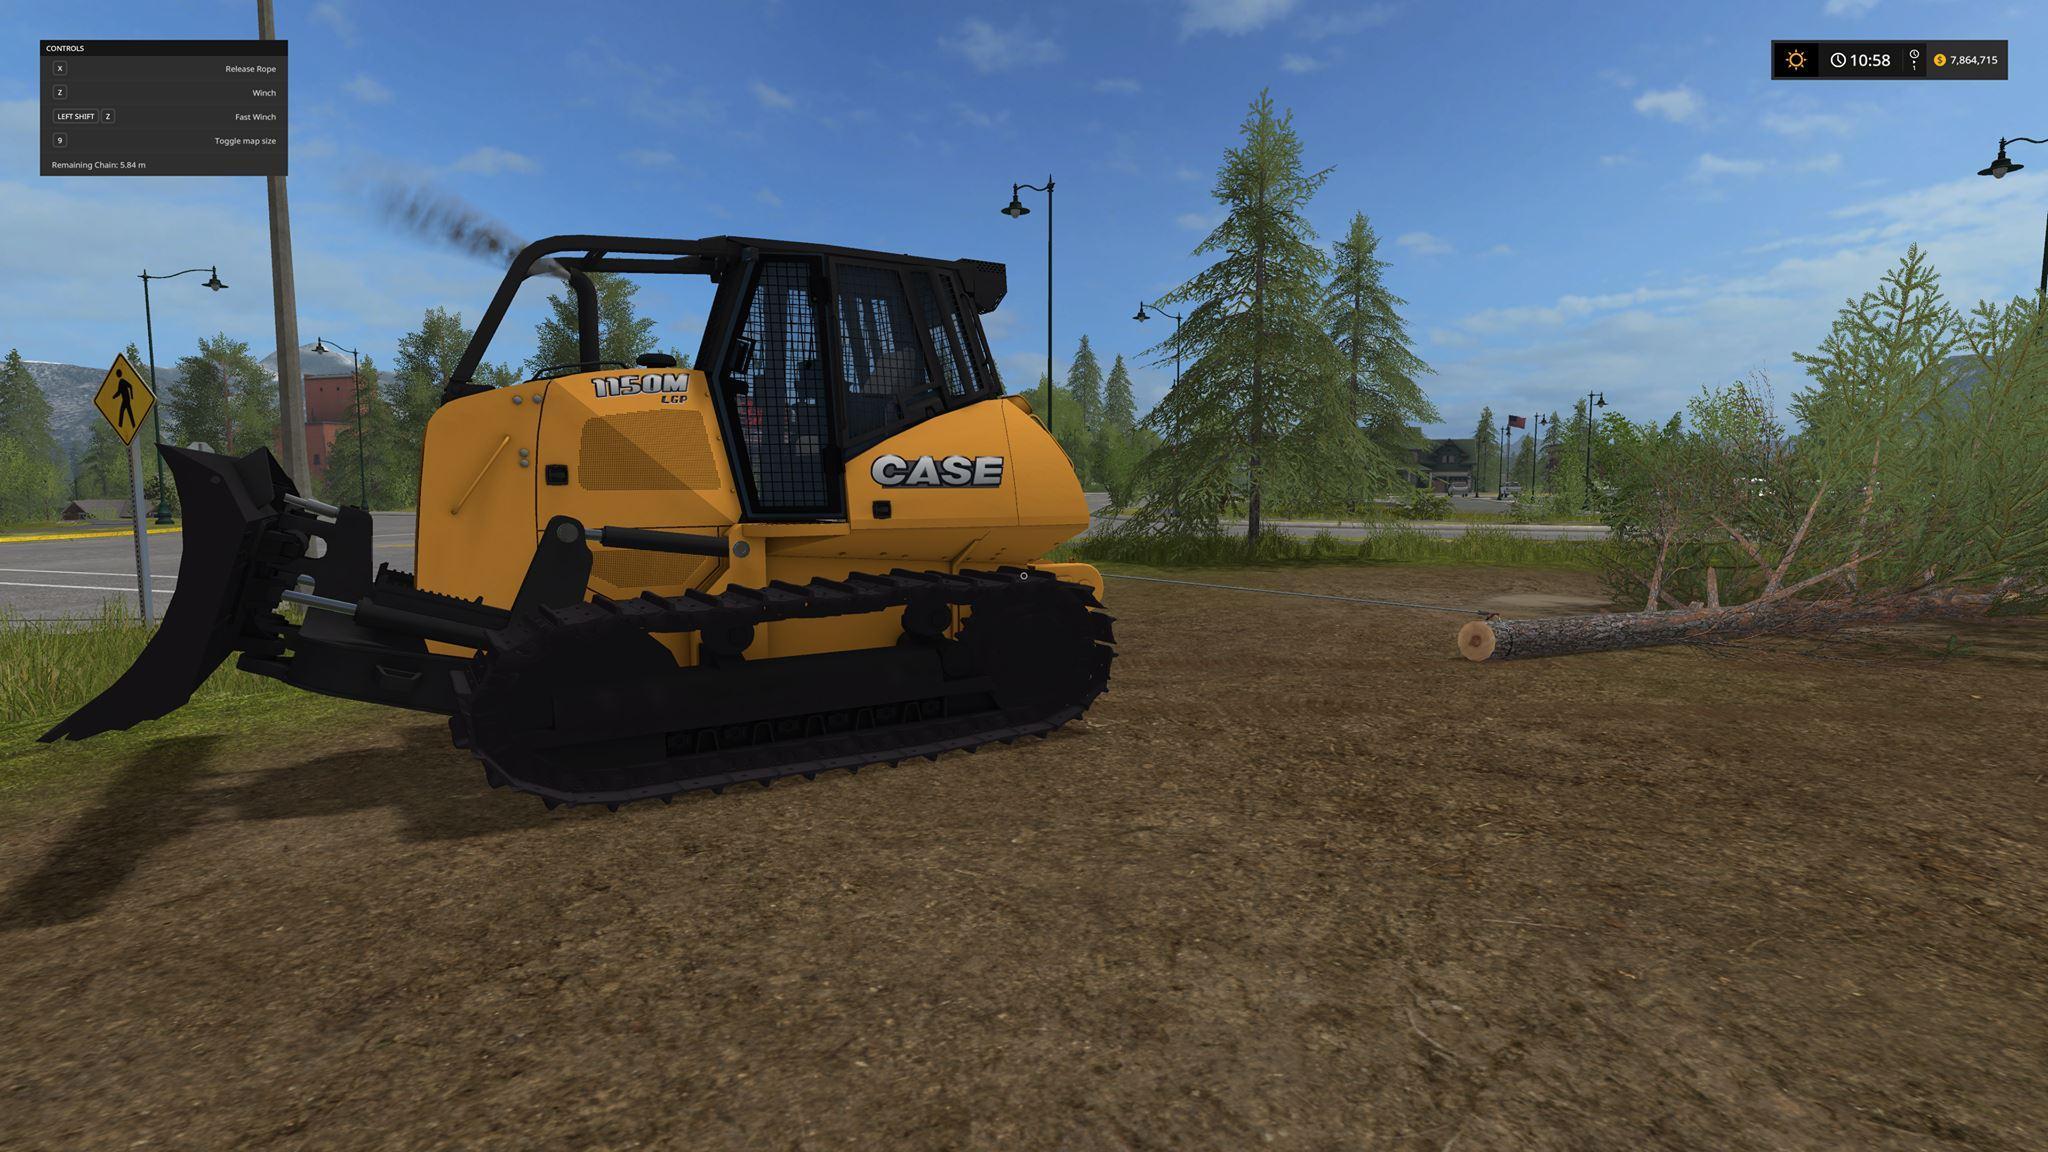 CASE 1150M Forestry v1 0 0 0 FS17 - Farming Simulator 17 mod